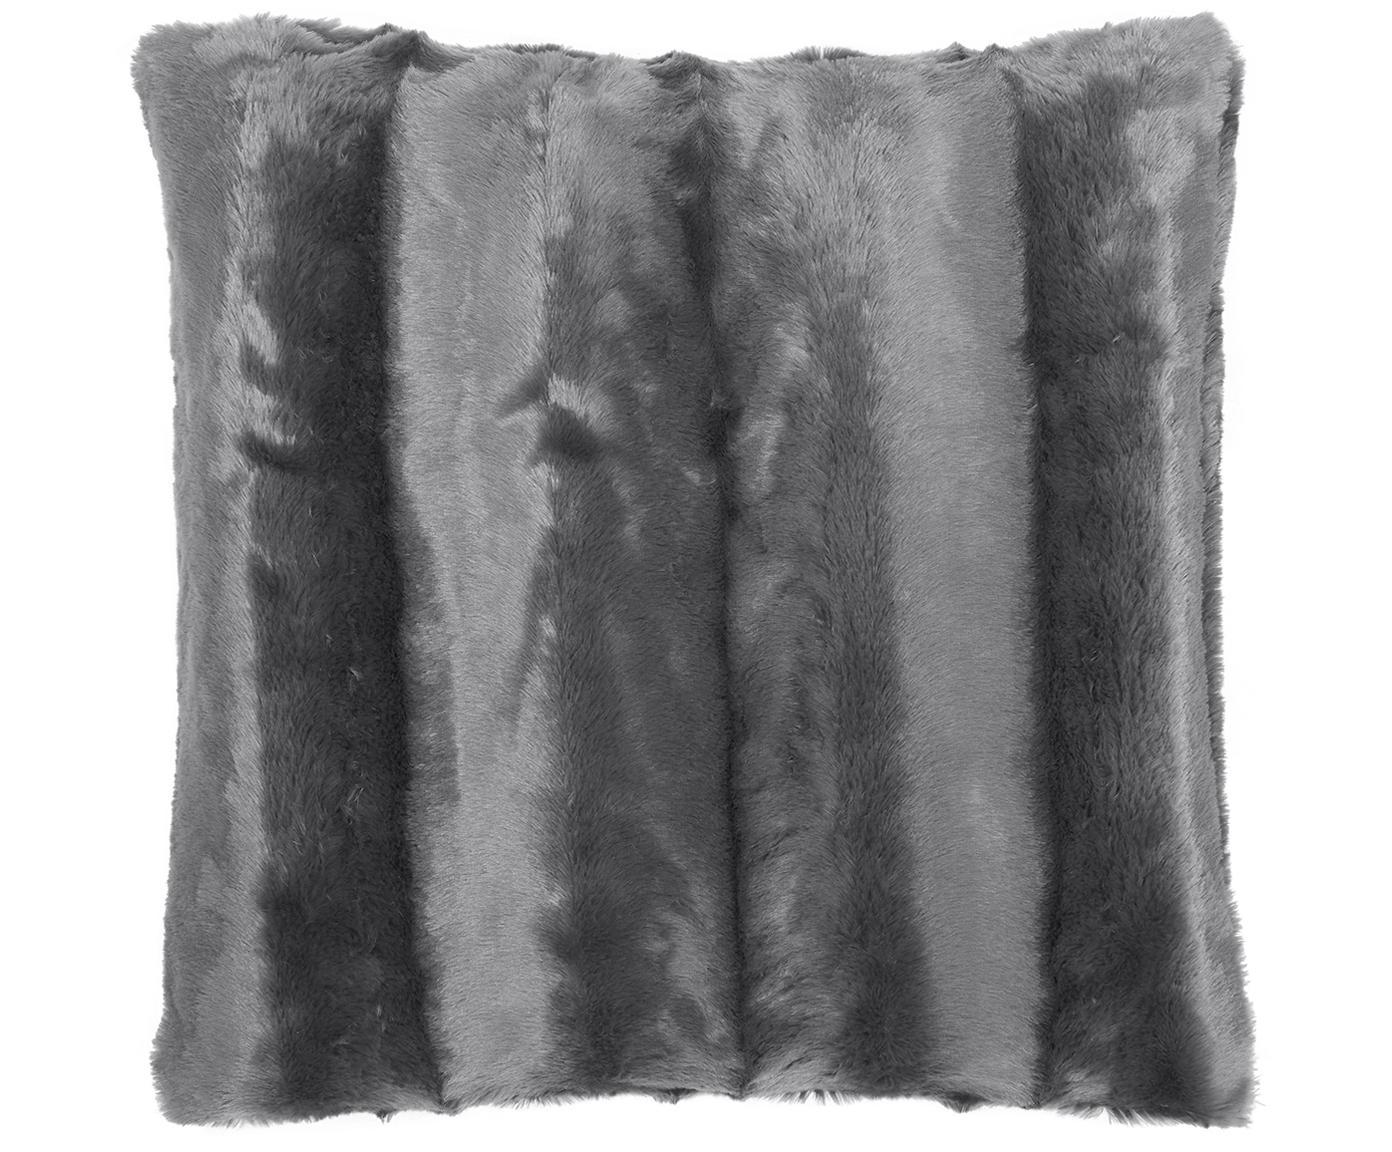 Kussenhoes van imitatievacht Alva, 100% polyester (imitatievacht), Donkergrijs, 45 x 45 cm